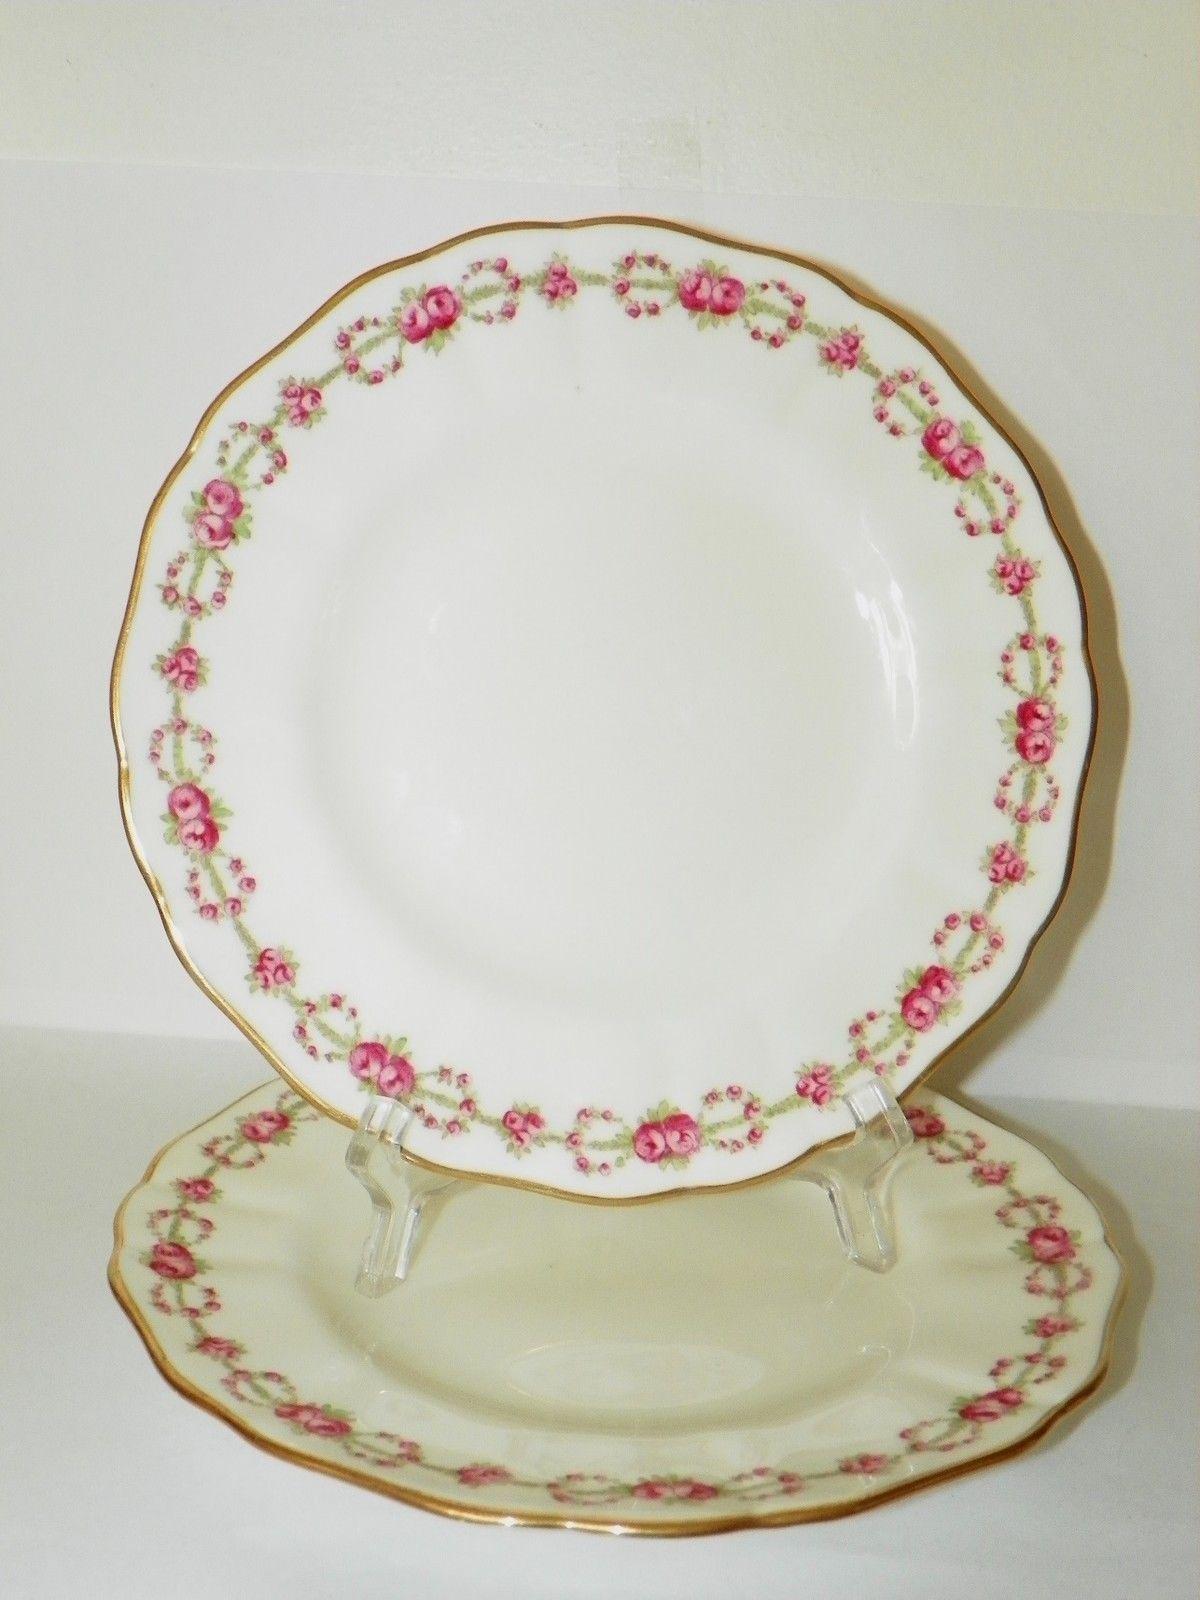 2 beautiful davis collamore co plates by cauldon roses Beautiful plates